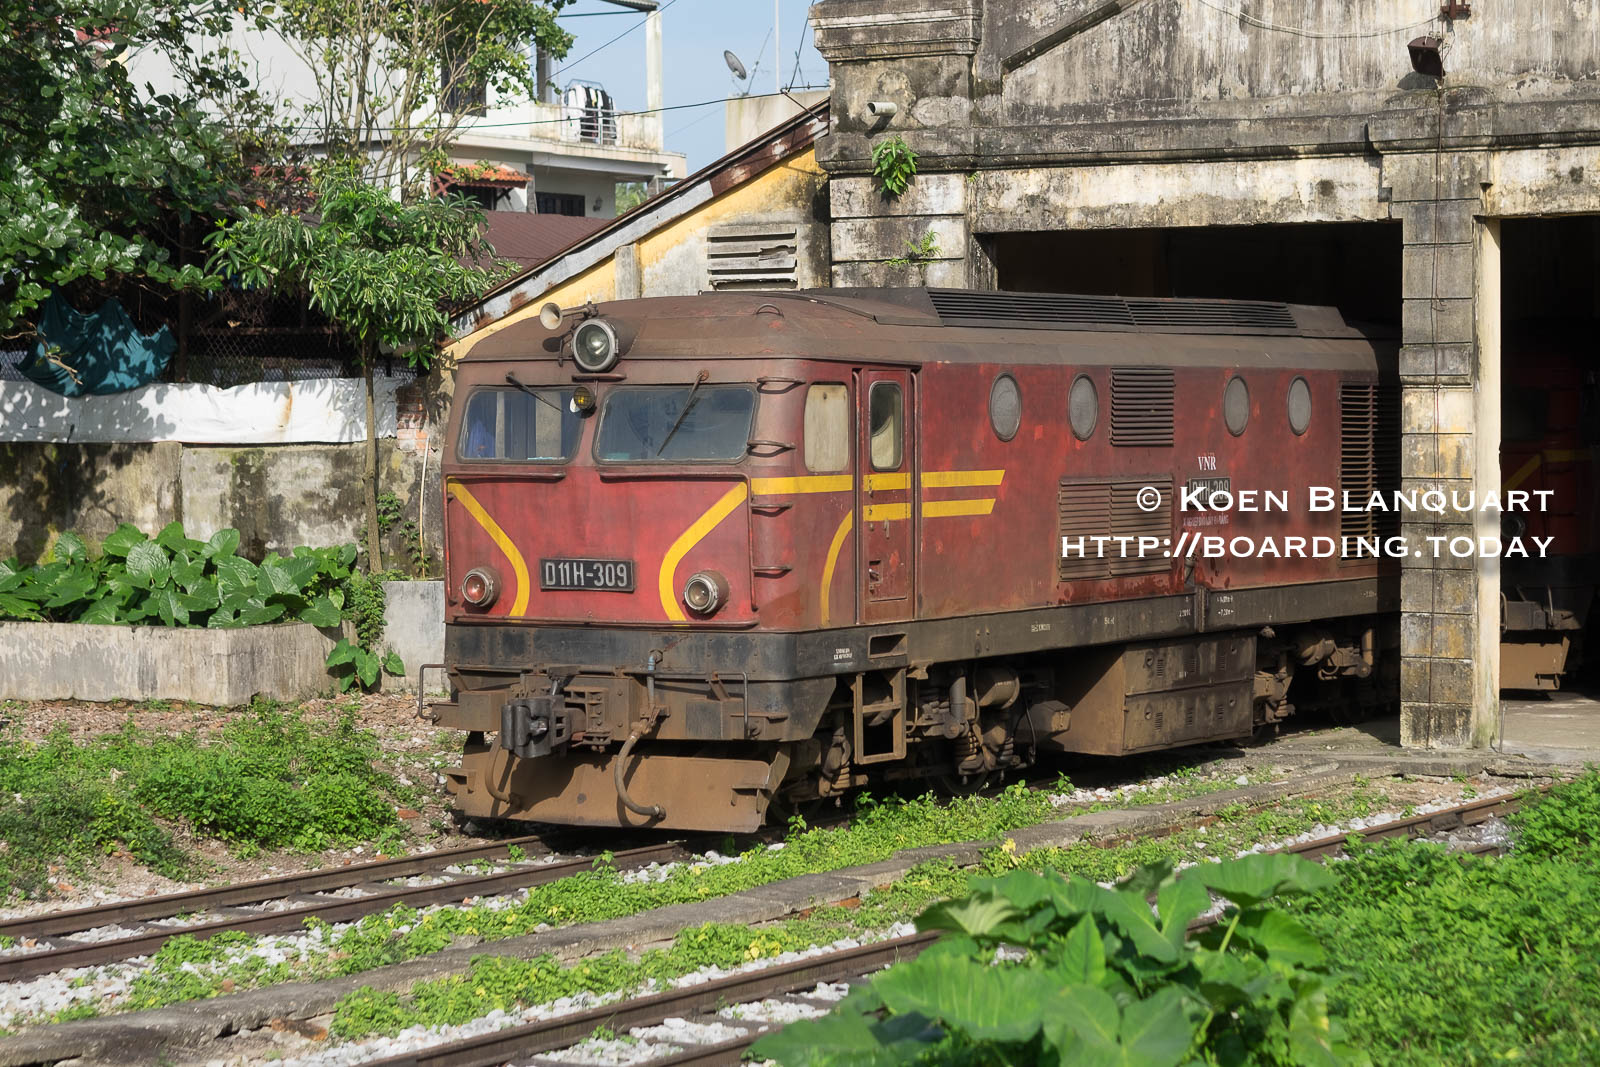 An older locomotive near the railway station of Hue, Vietnam